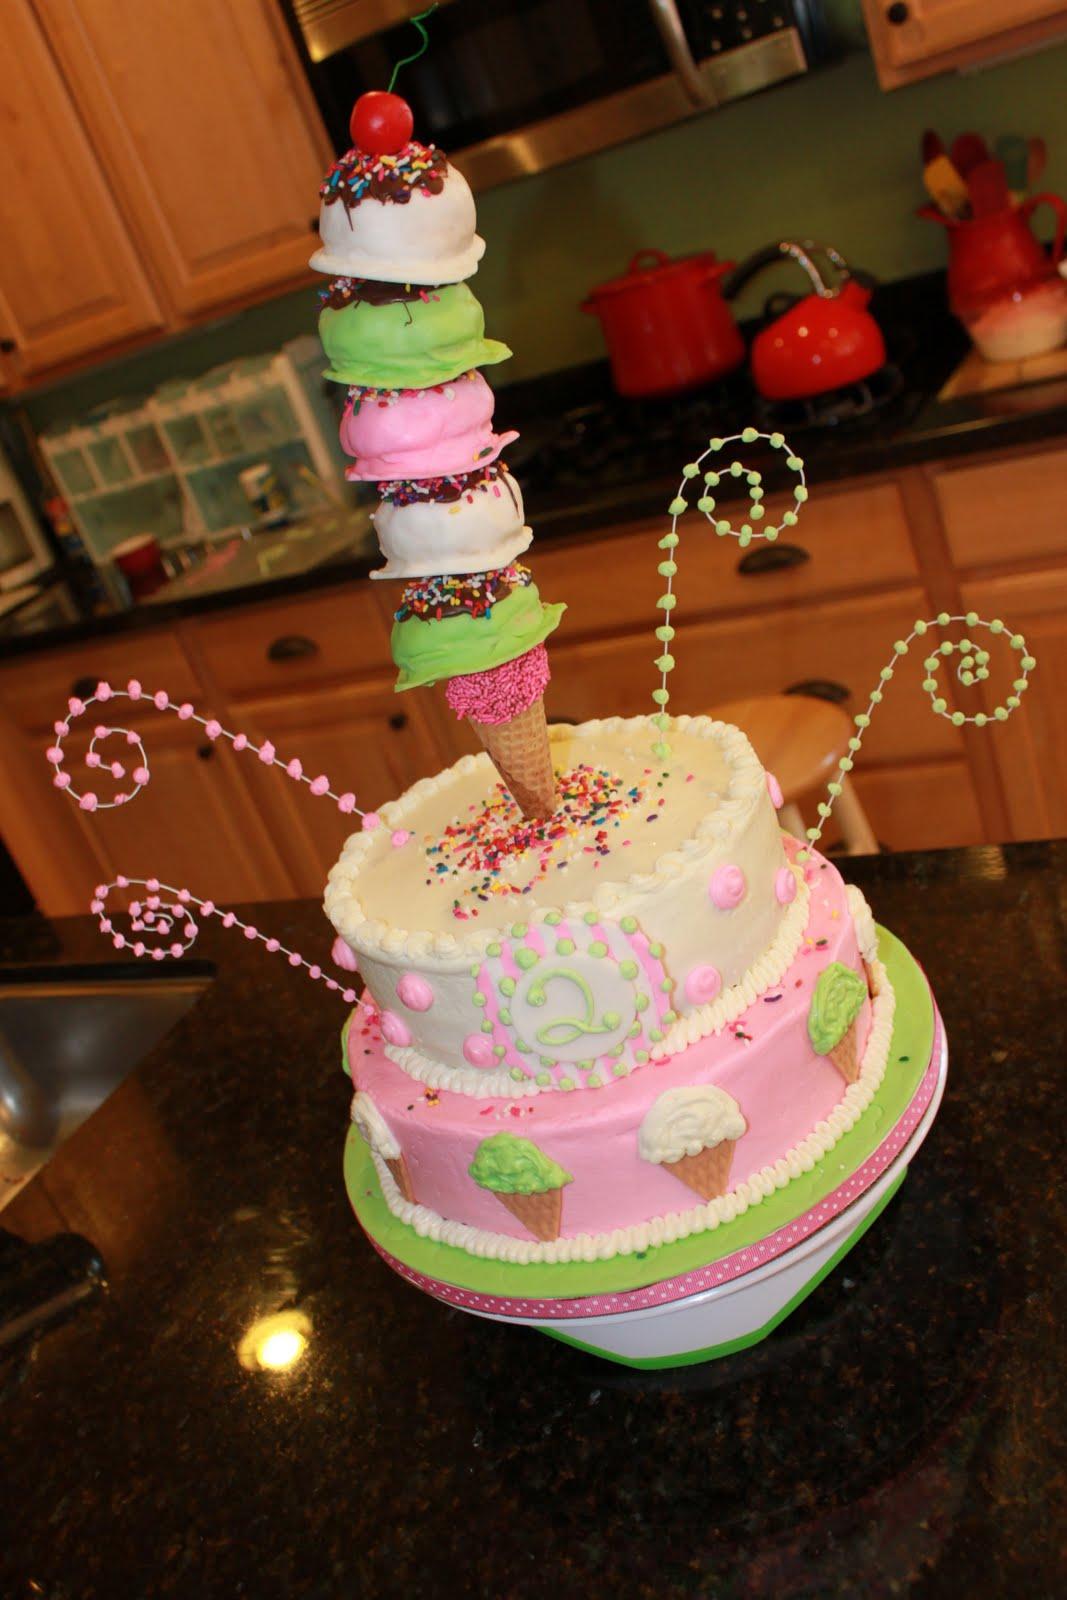 Katiediditcakes: Ice Cream theme cake